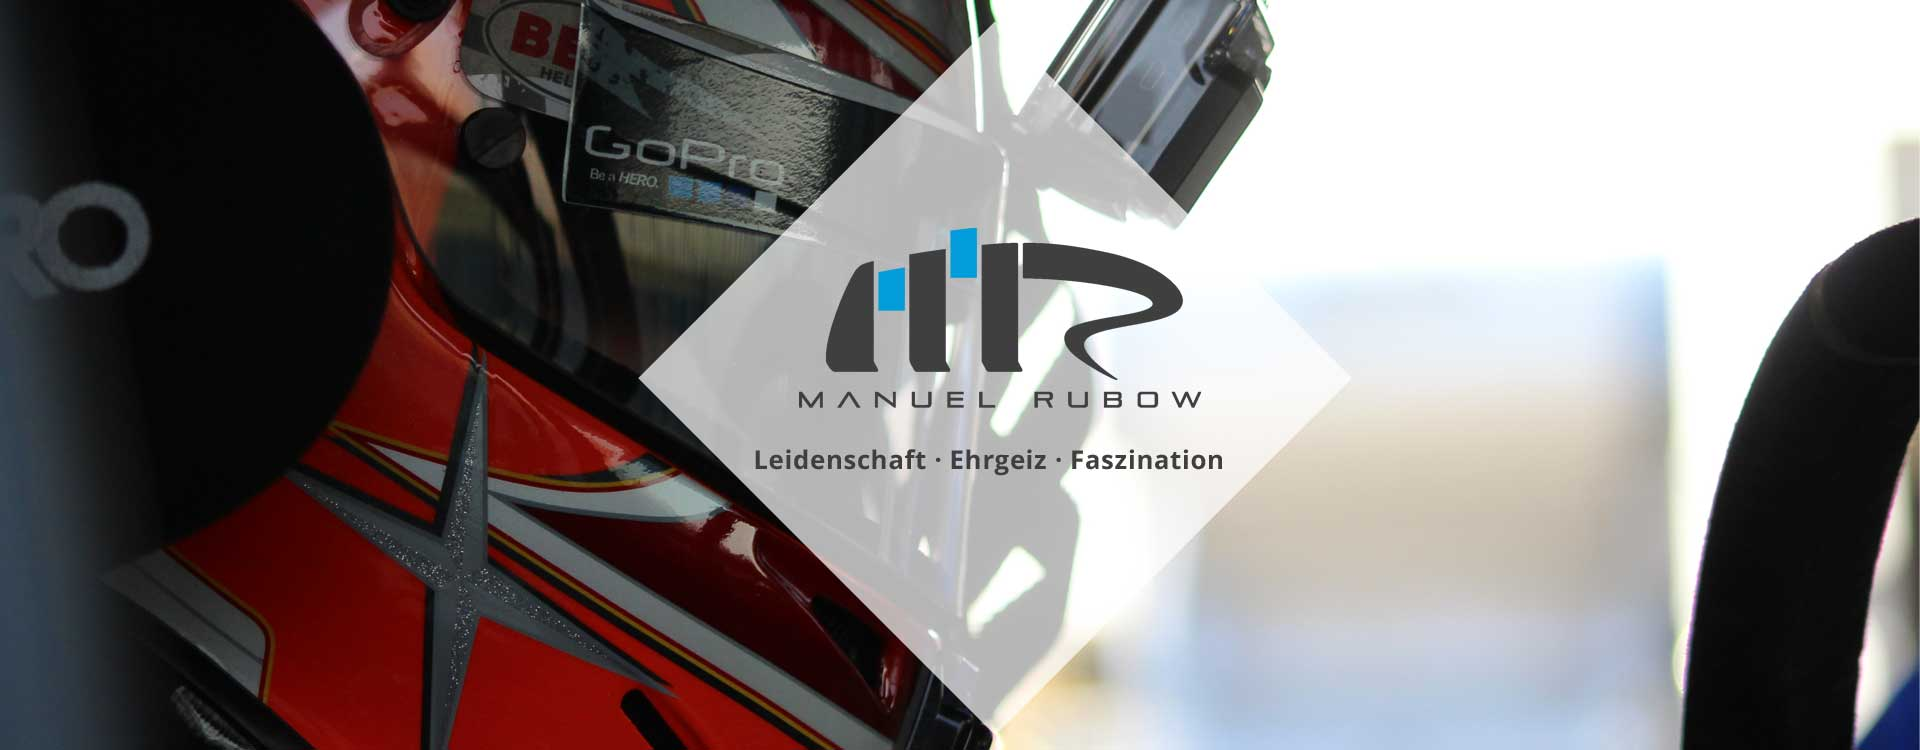 Manuel_Rubow_Slide02